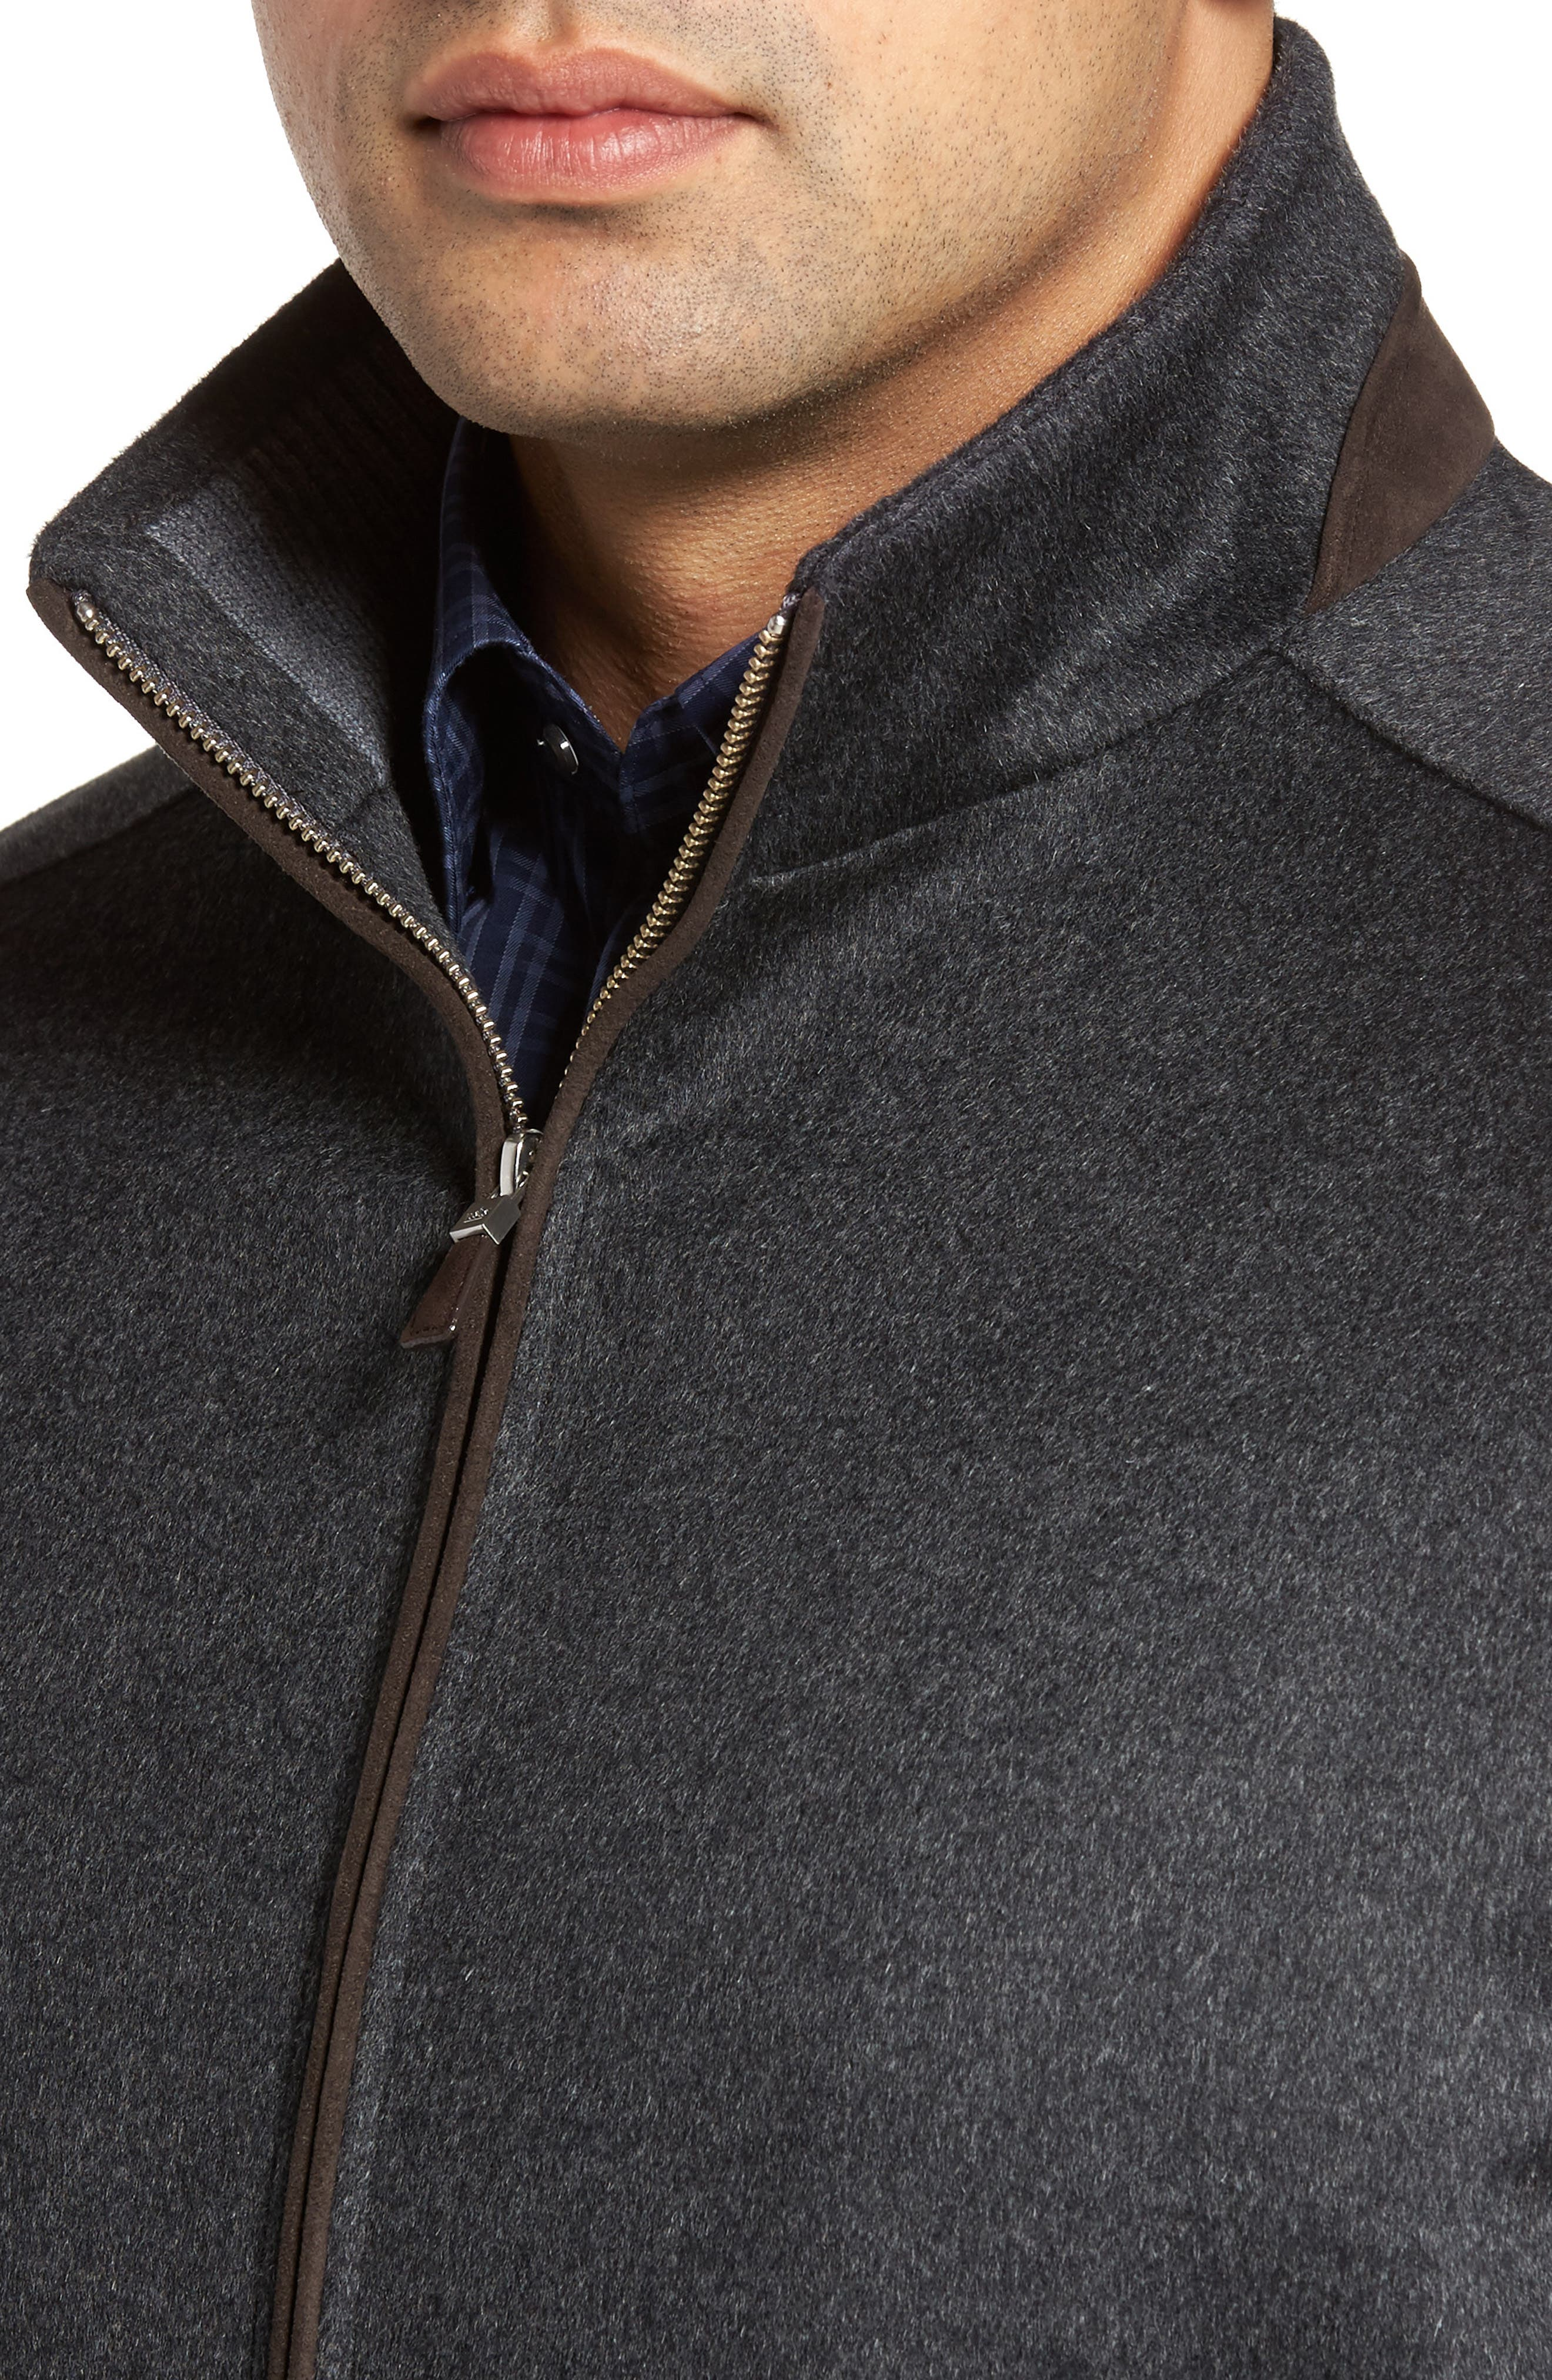 Westport Wool & Cashmere Jacket,                             Alternate thumbnail 11, color,